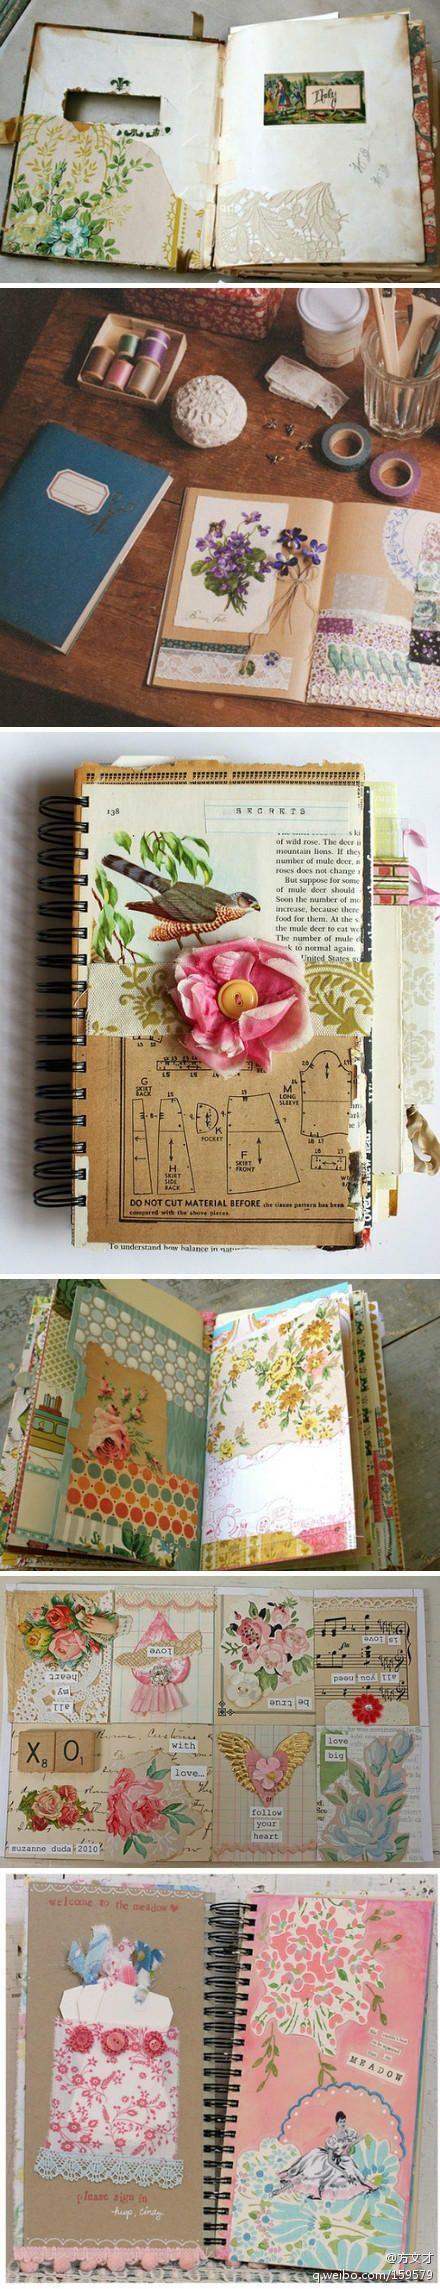 Beautiful junk journal, book, sketchbook